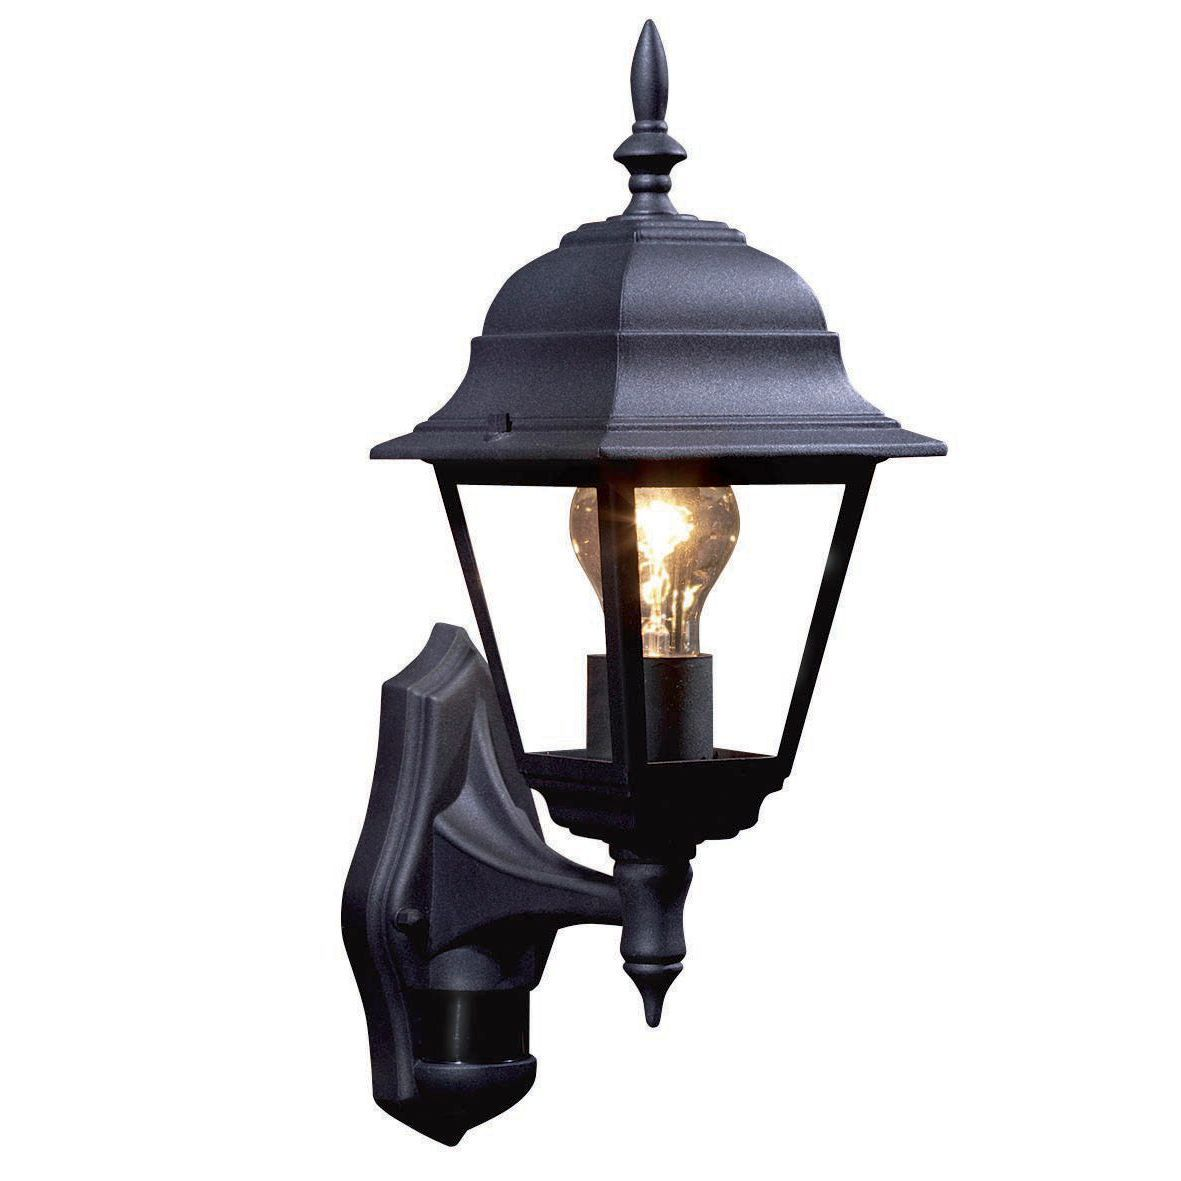 Polperro black 60w mains powered external pir lantern house front bq polperro black external lantern with pir sensor departments diy at bq good reviews workwithnaturefo